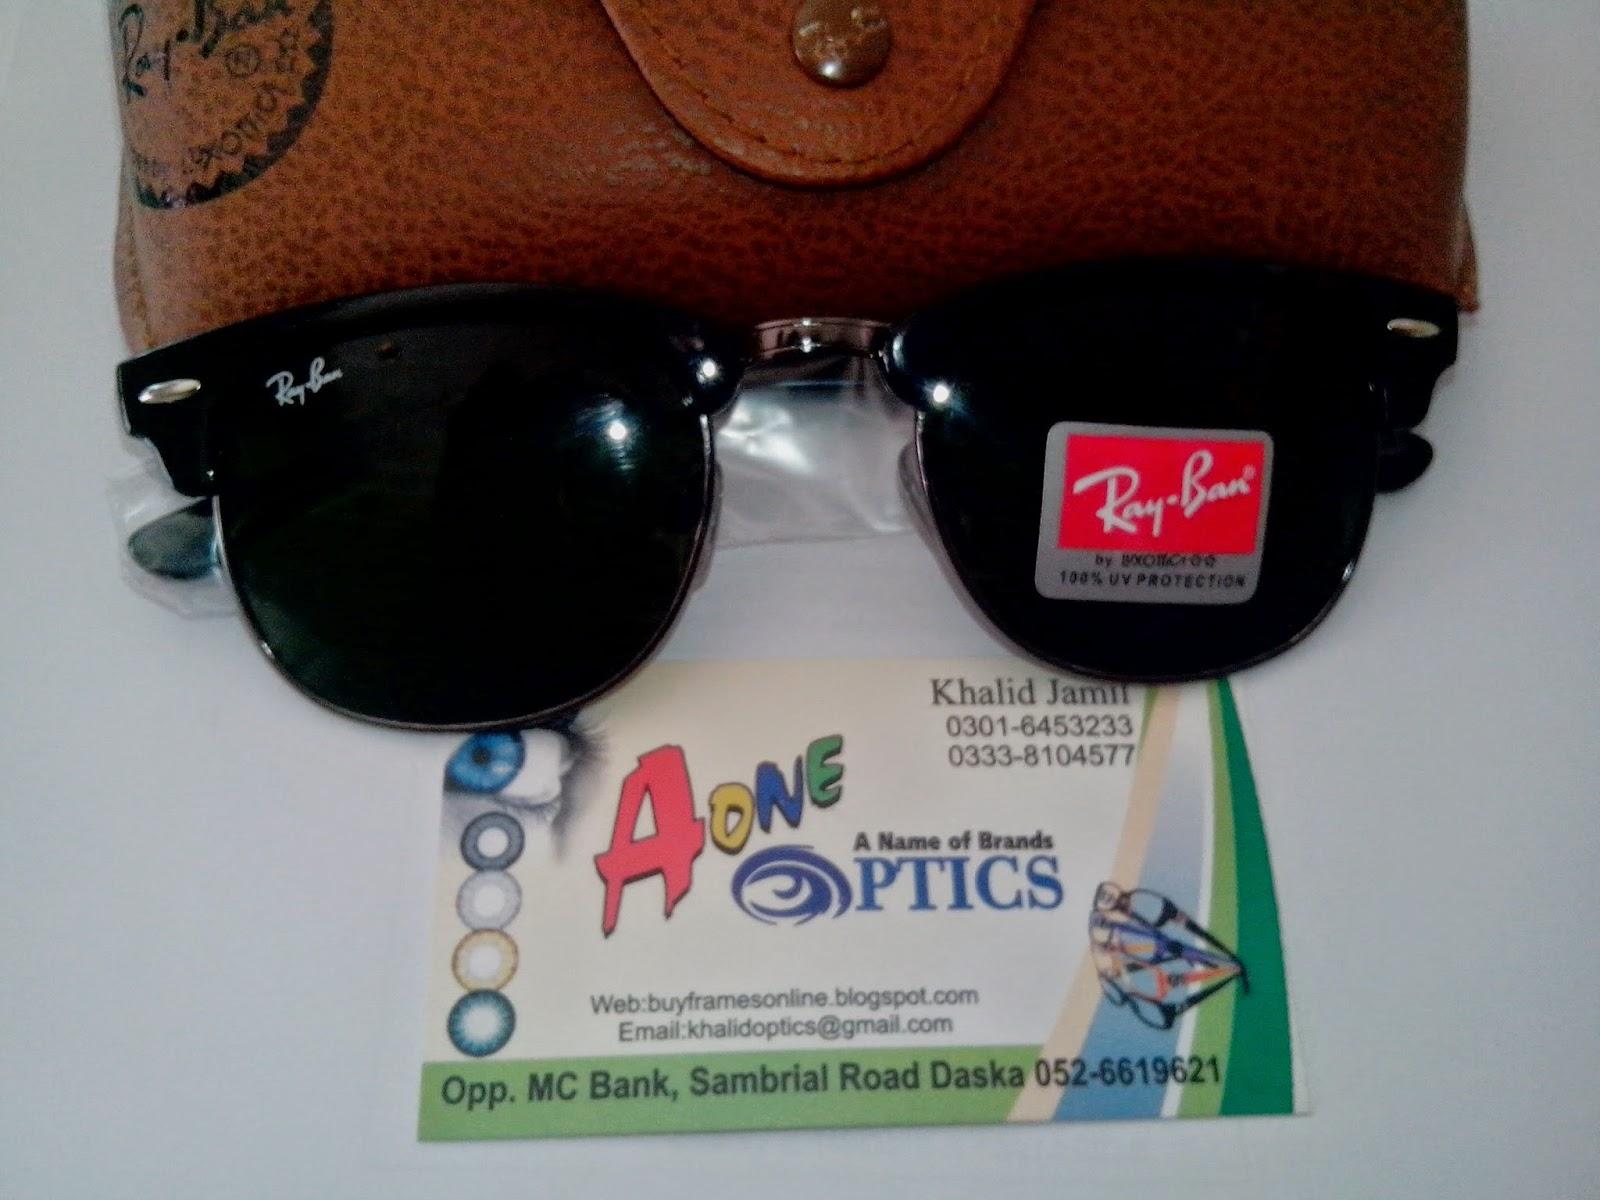 ray ban sunglasses price in pakistan 2014